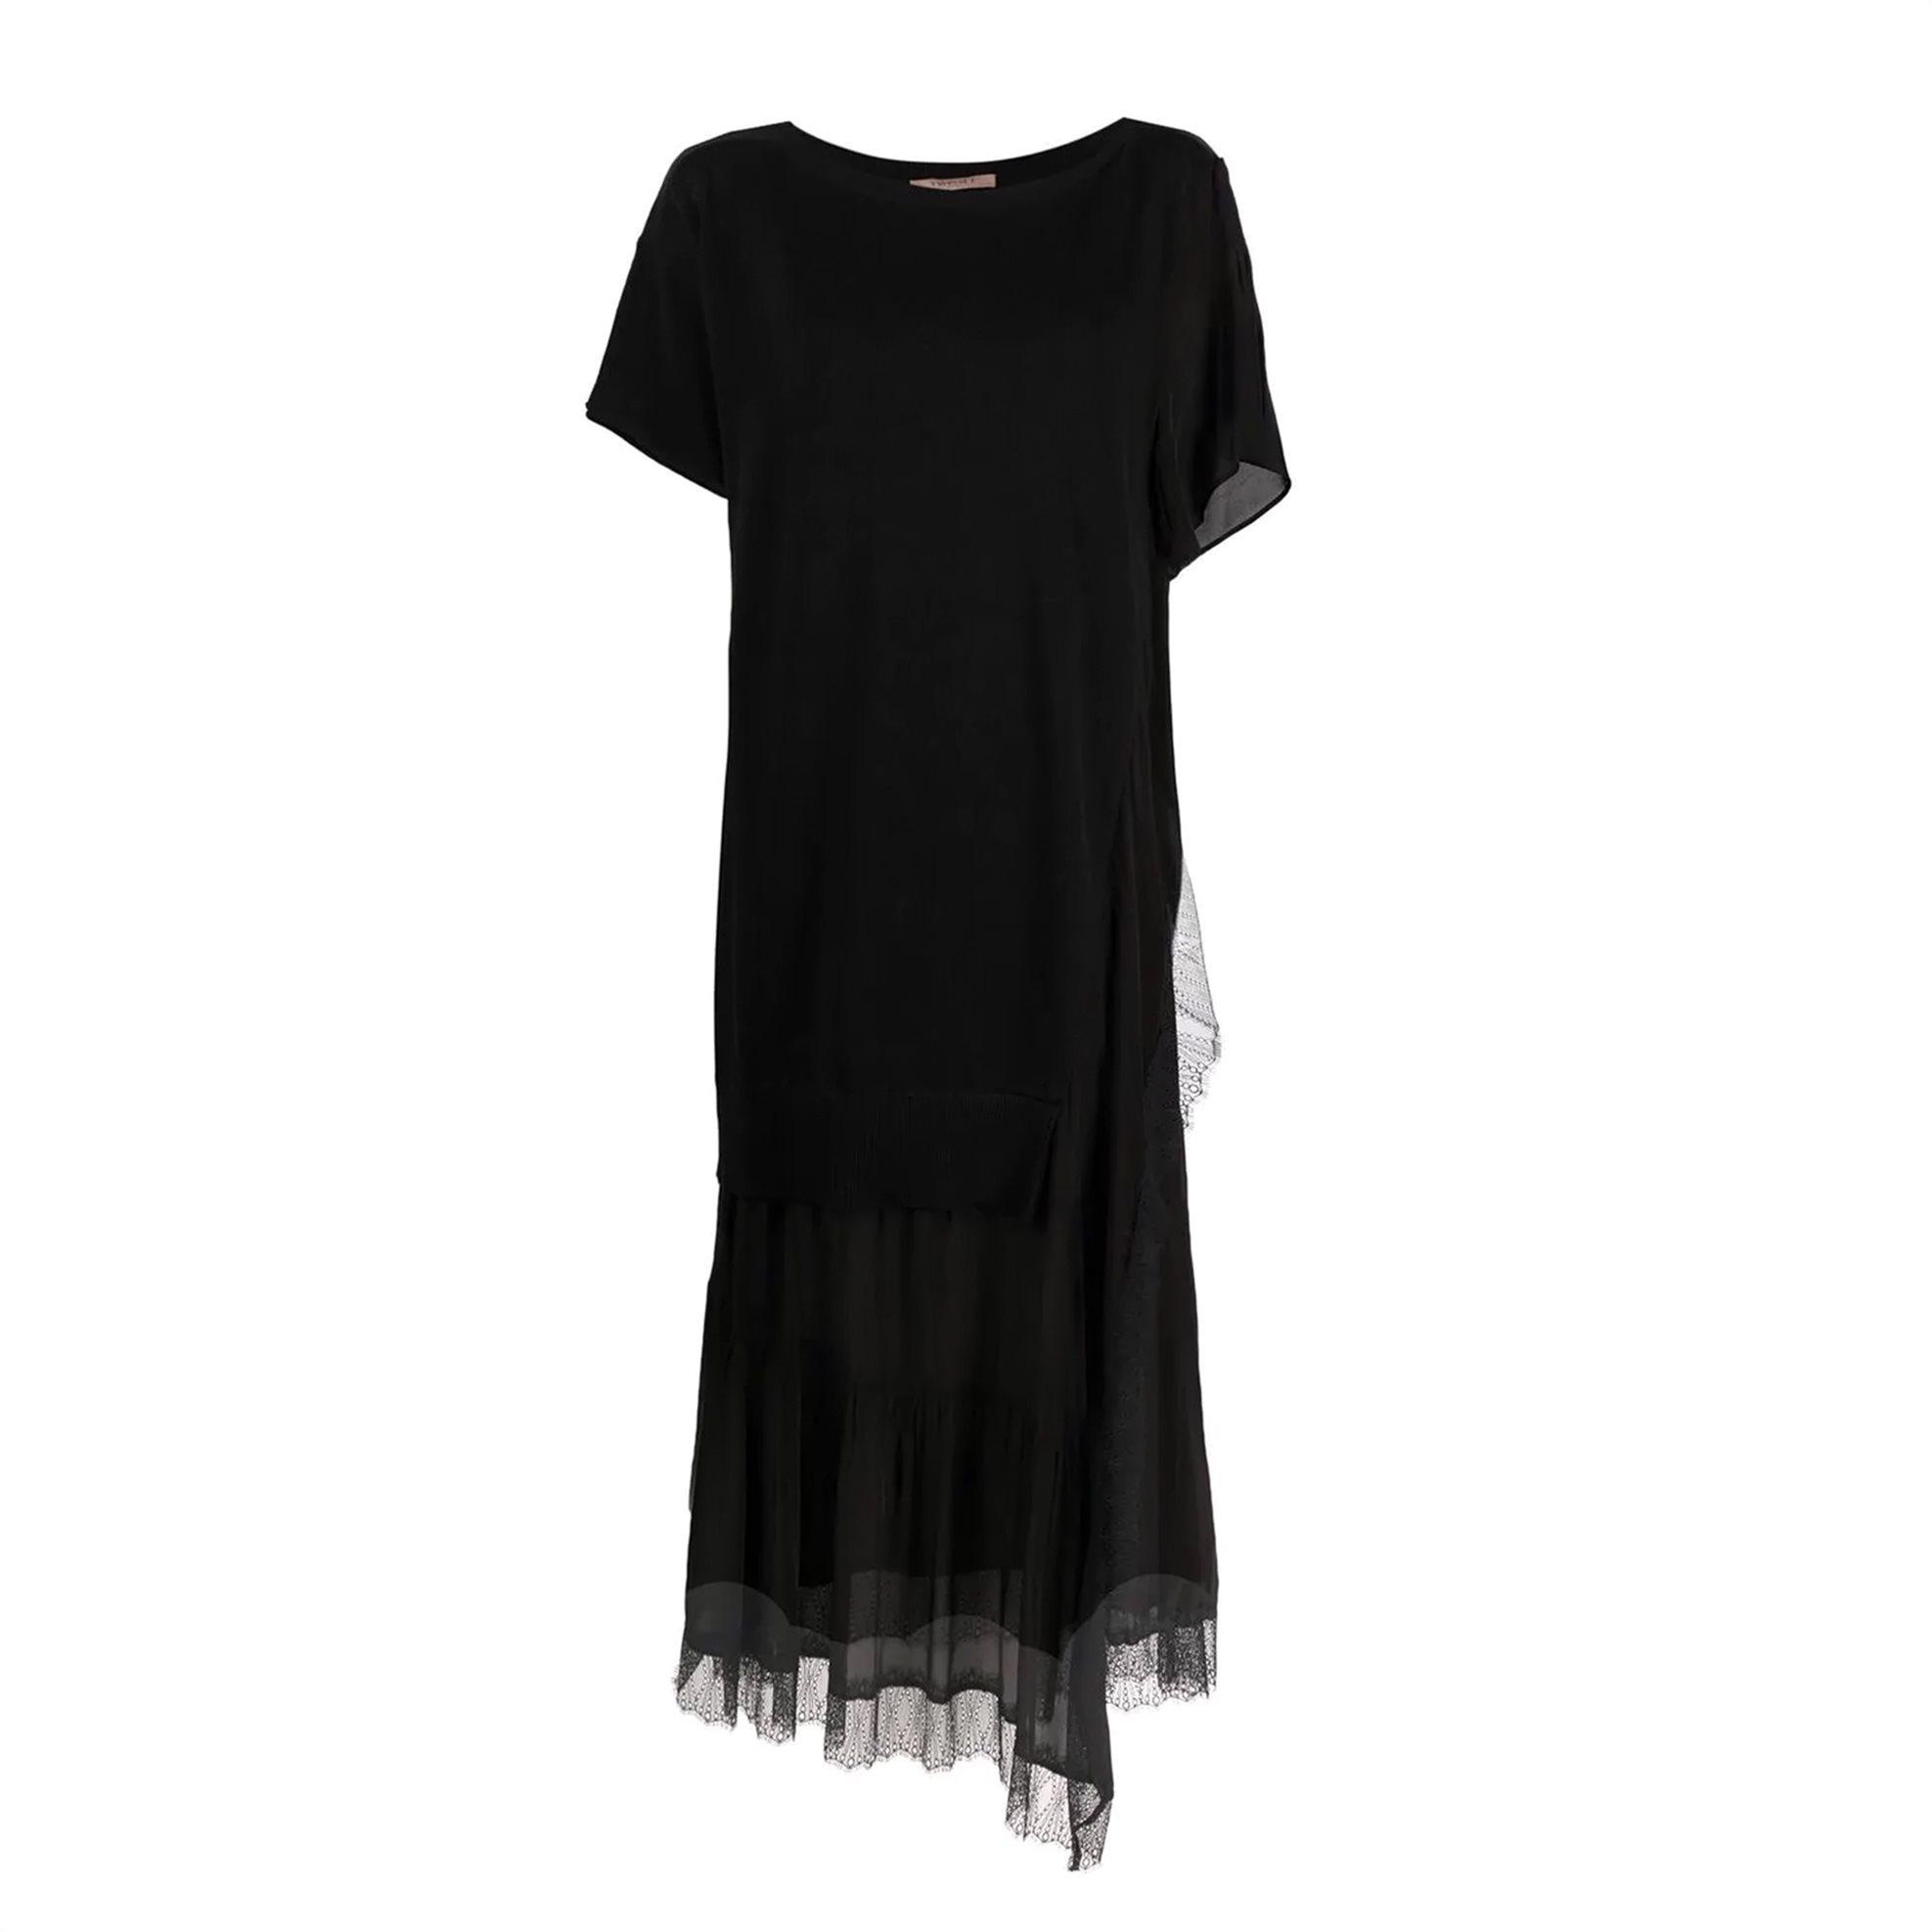 Twinset γυναικείο midi φόρεμα κοντομάνικο με διαφορετικές υφές βολάν και δαντέλα τελείωμα - 211TT3151 - Μαύρο